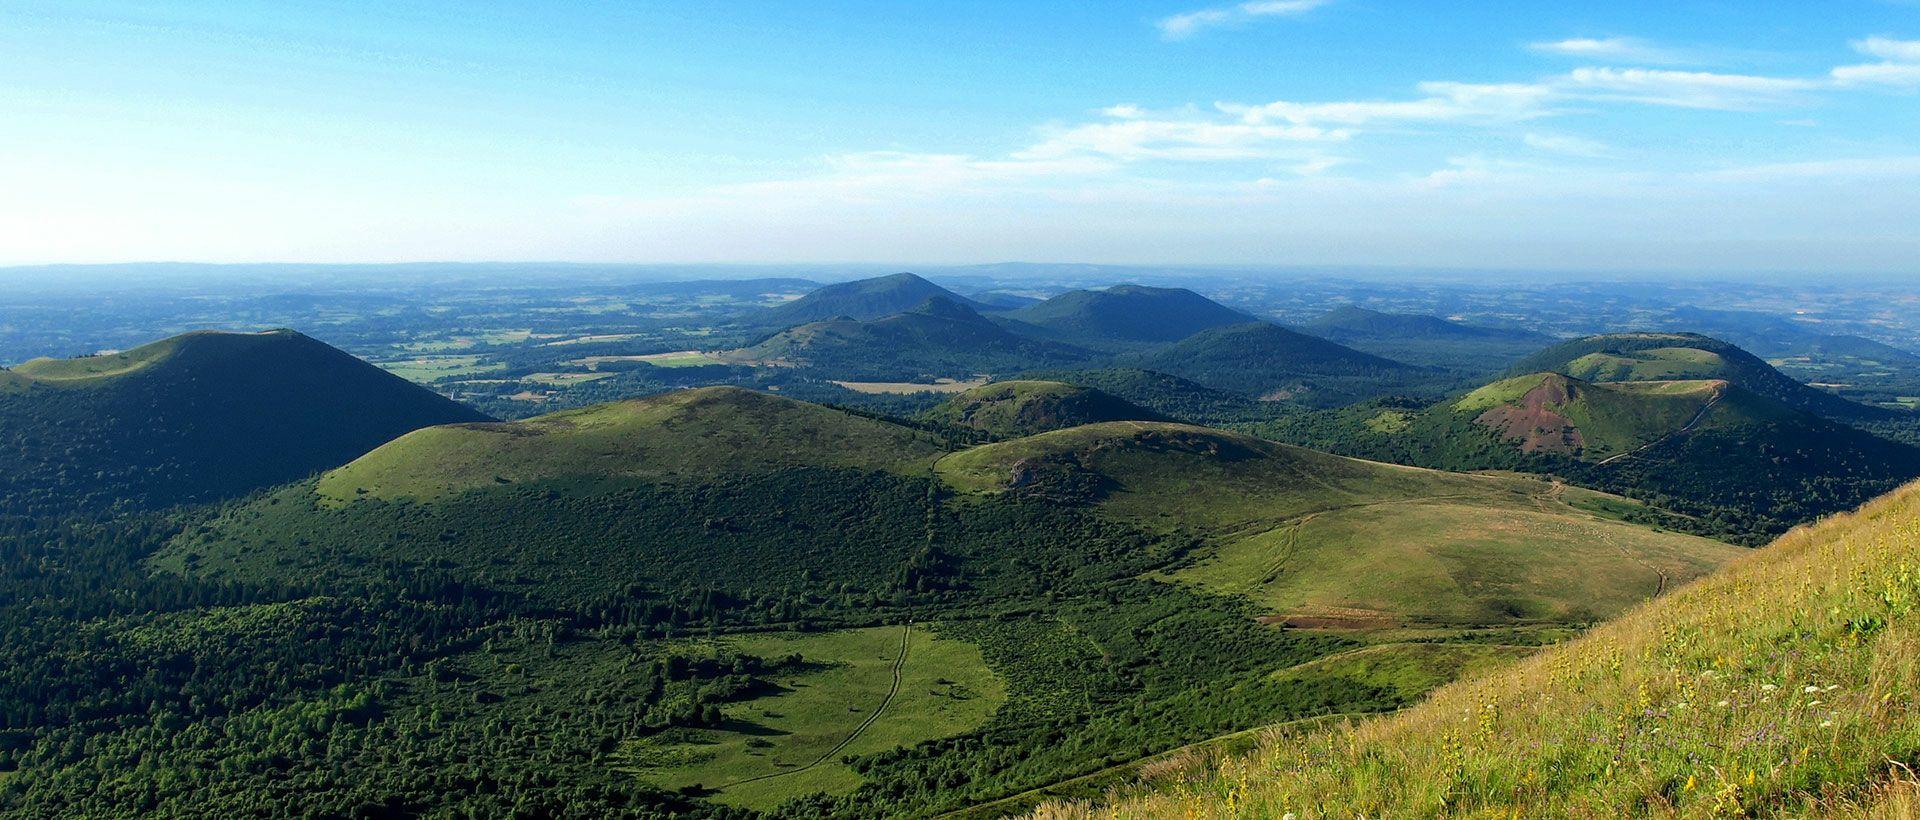 Camping Auvergne Volcanoes Natural Regional Park